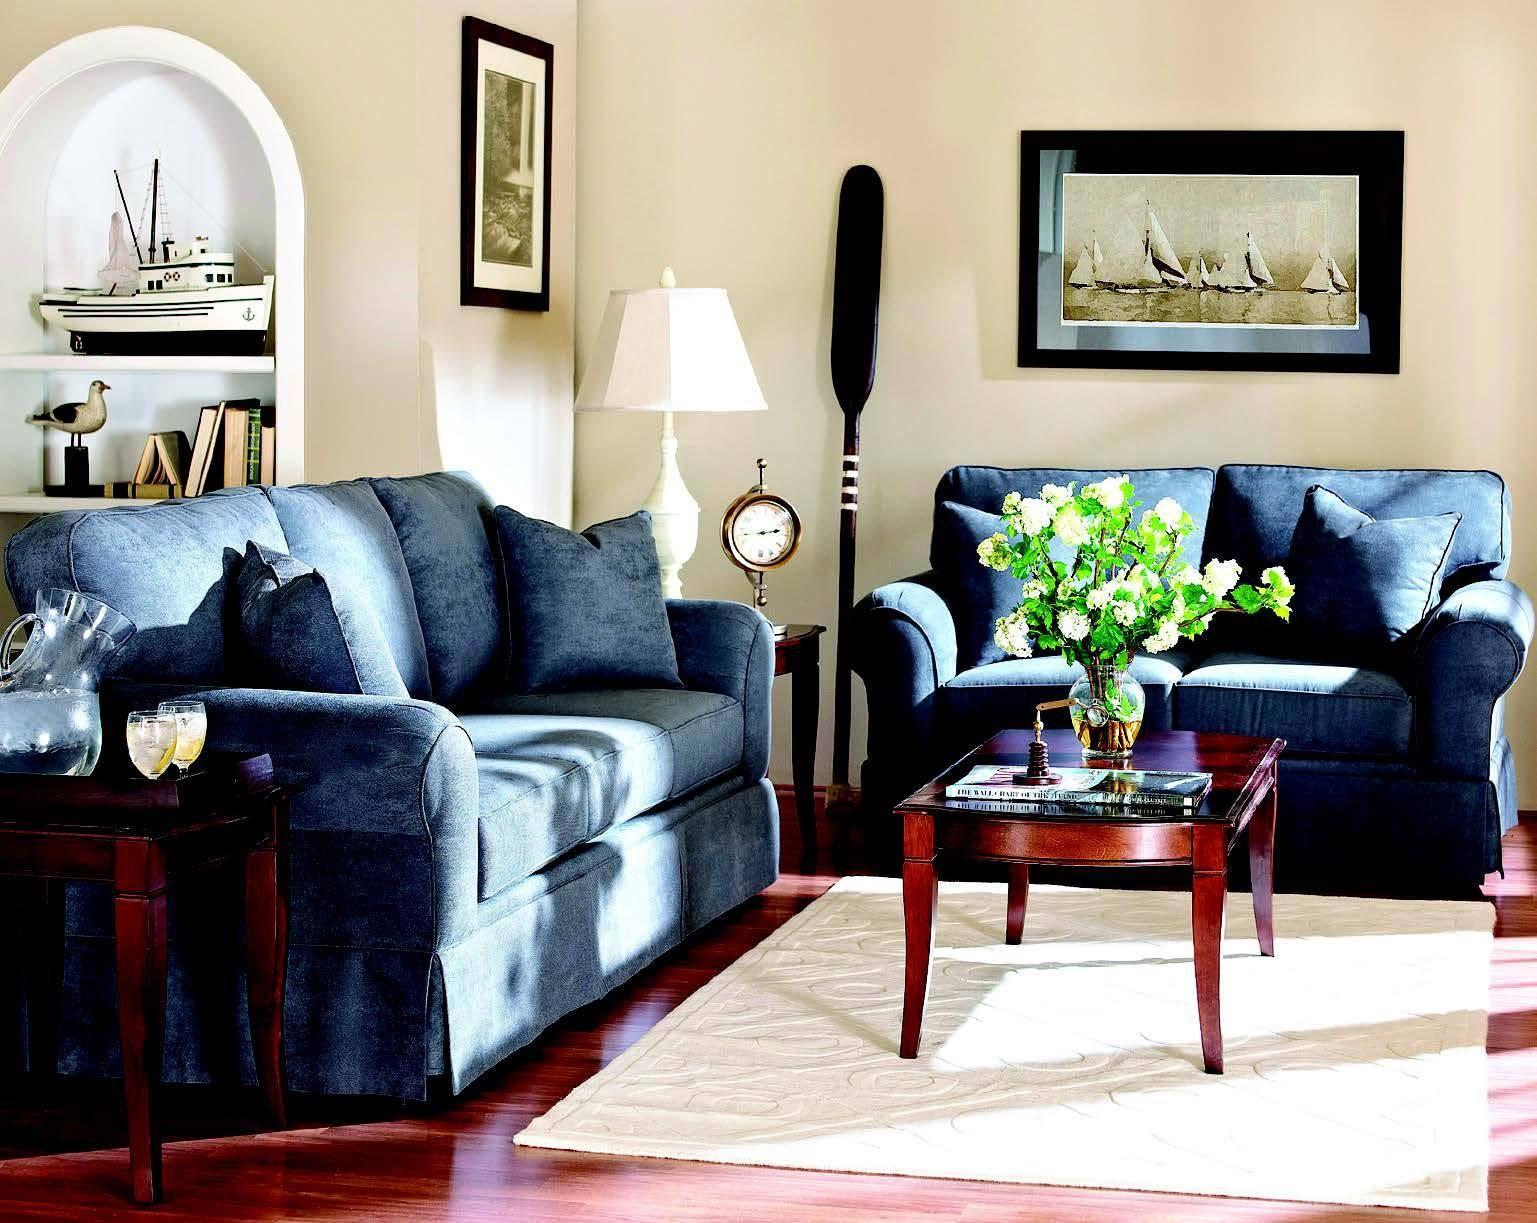 Best Cardisfurniture Cardis Furniture Inspiration Inspire 400 x 300